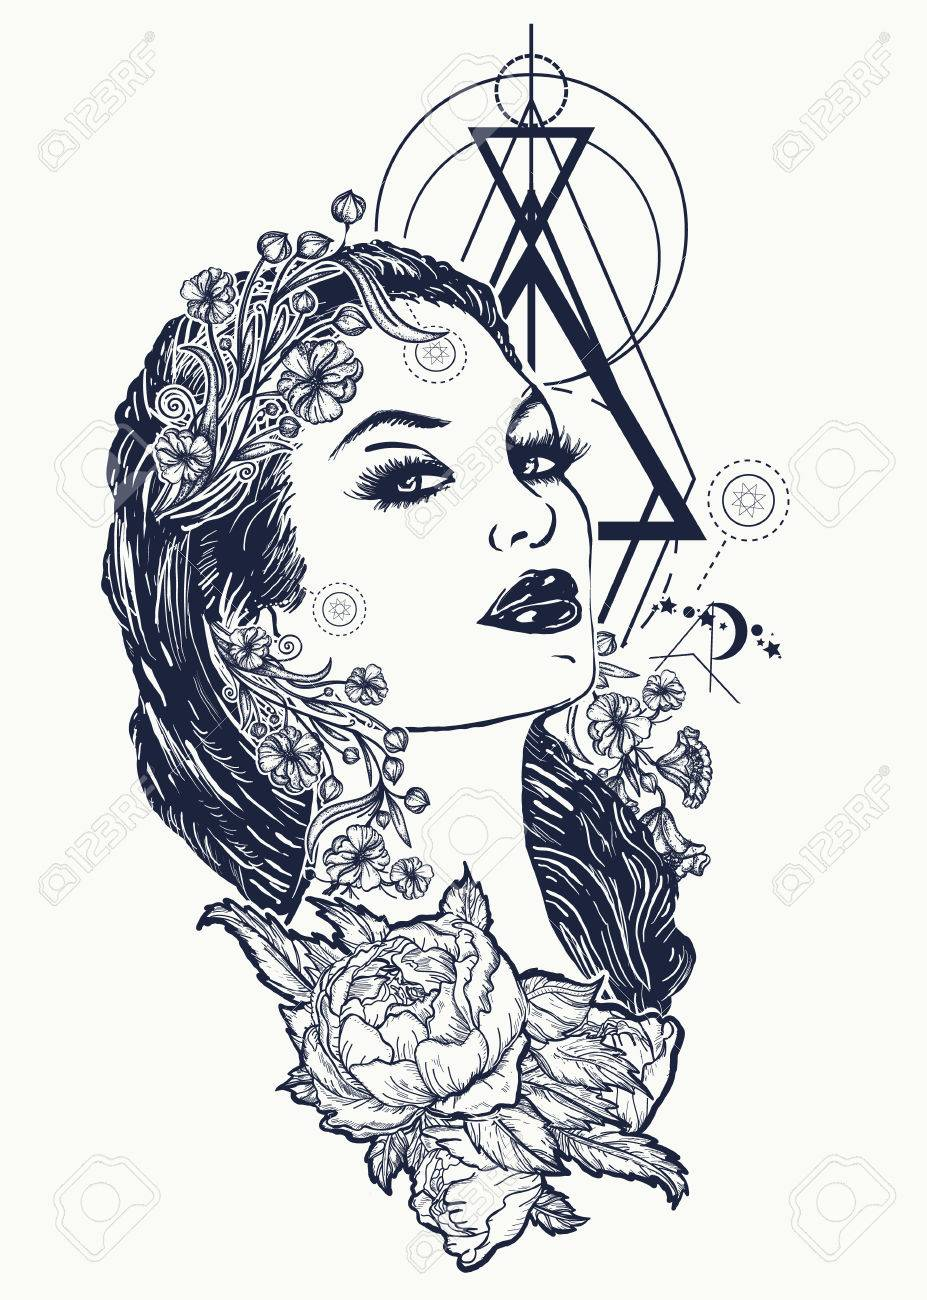 Art nouveau woman tattoo and t-shirt design. Symbol of a retro, queen, princess, lady, elegance, glamour, renaissance. Beautiful glamourous vintage art nouveau woman tattoo. Noir woman - 86176580